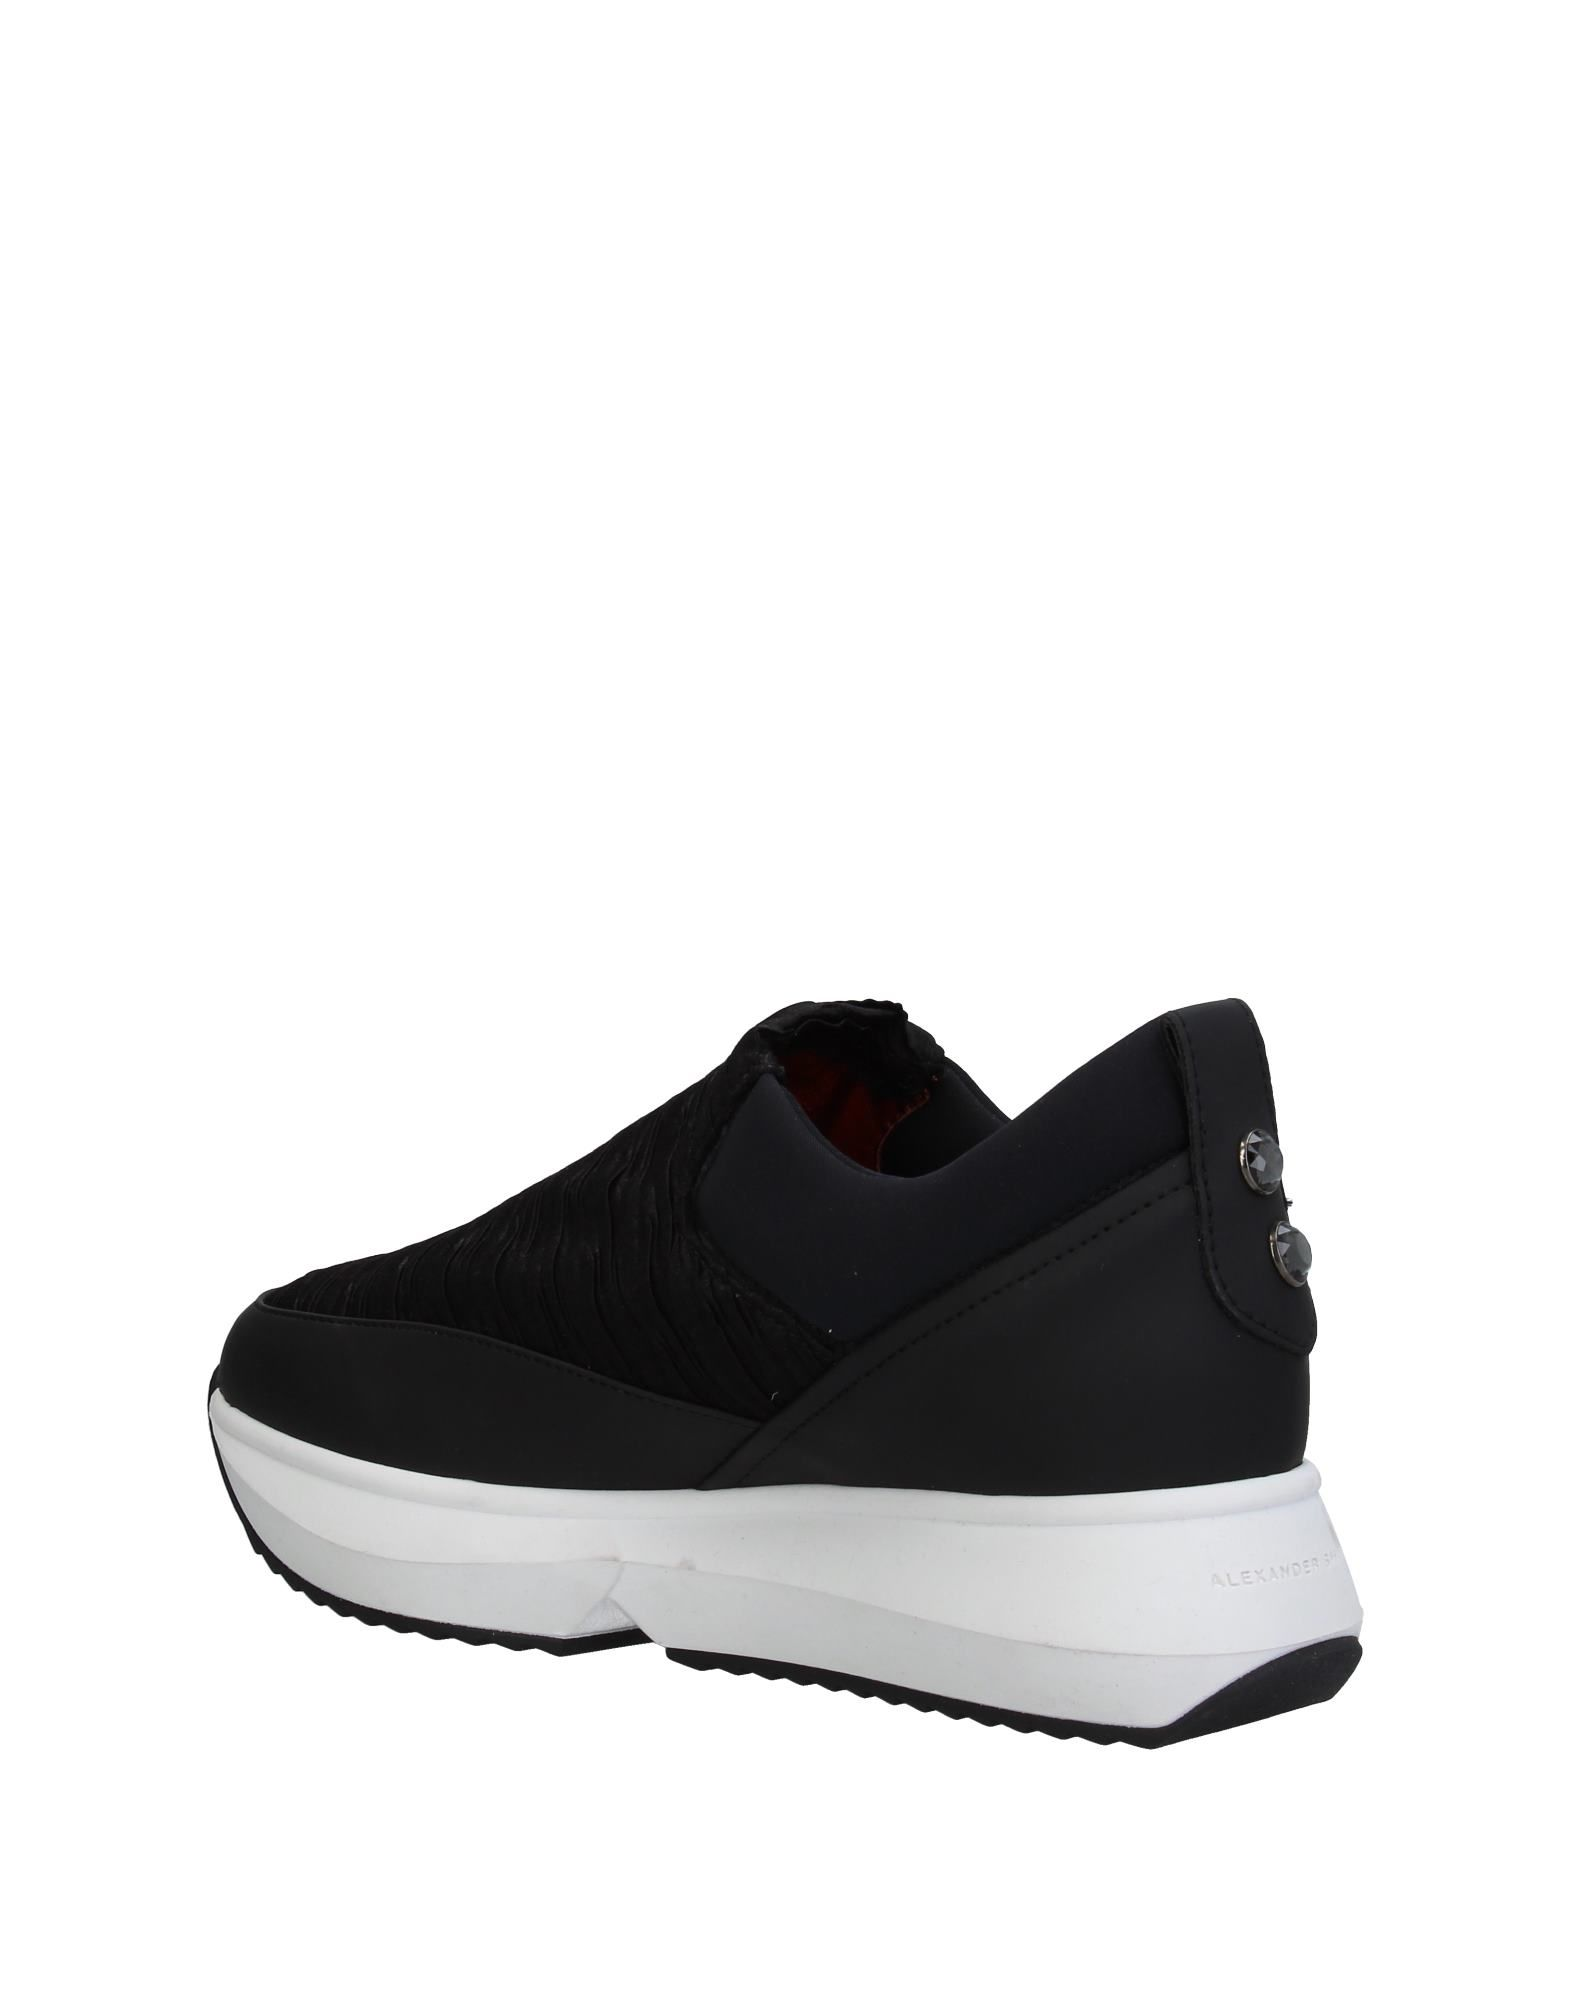 Stilvolle billige Damen Schuhe Alexander Smith Sneakers Damen billige  11390507MG d9cb84